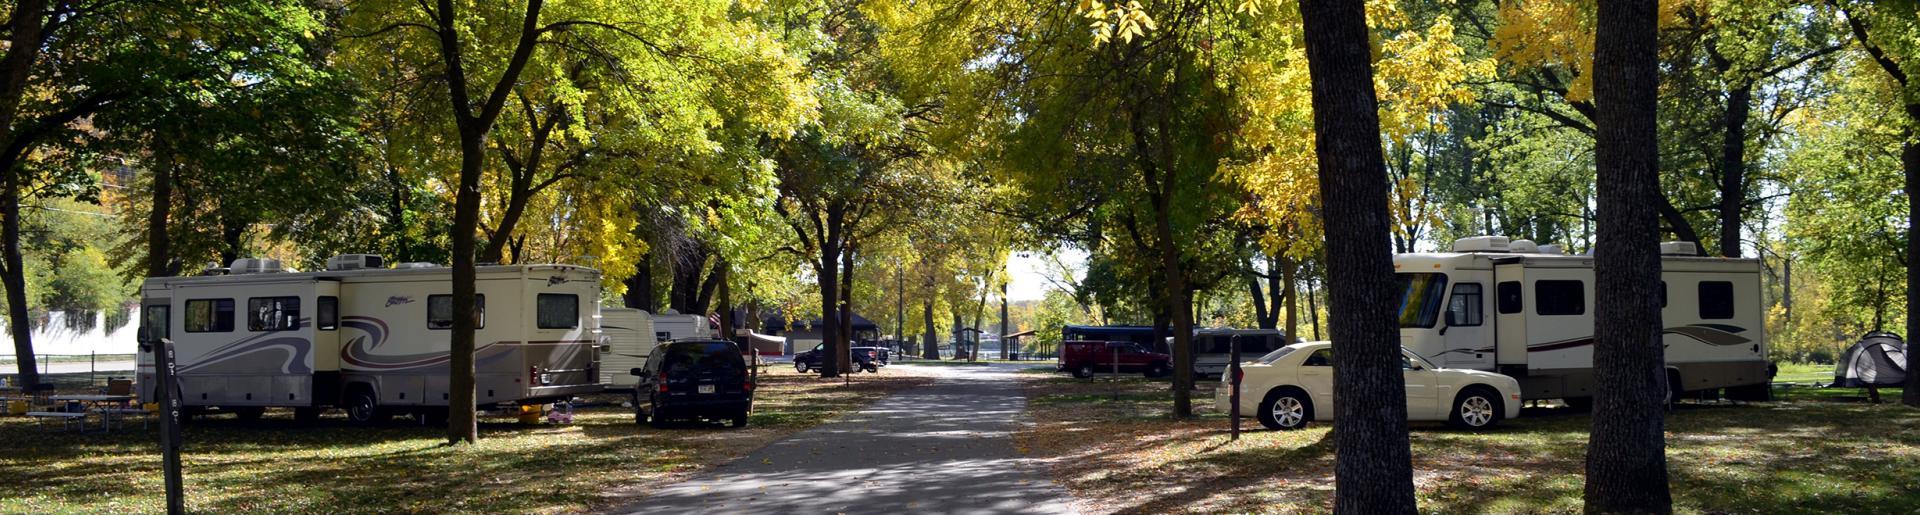 Camping at Dane County Parks